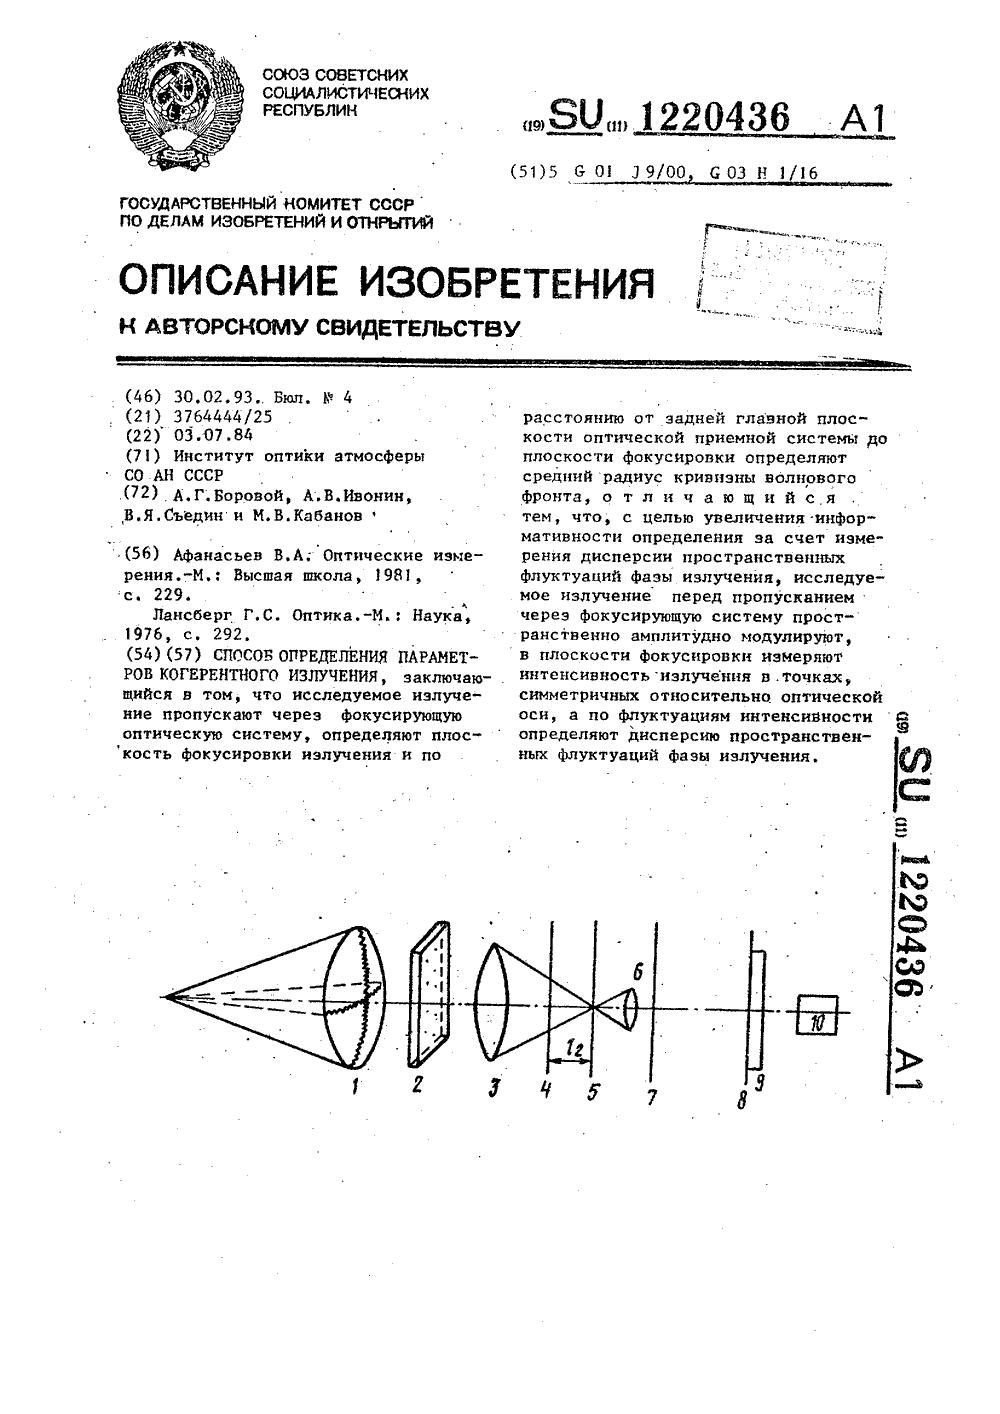 Трихроматический фото